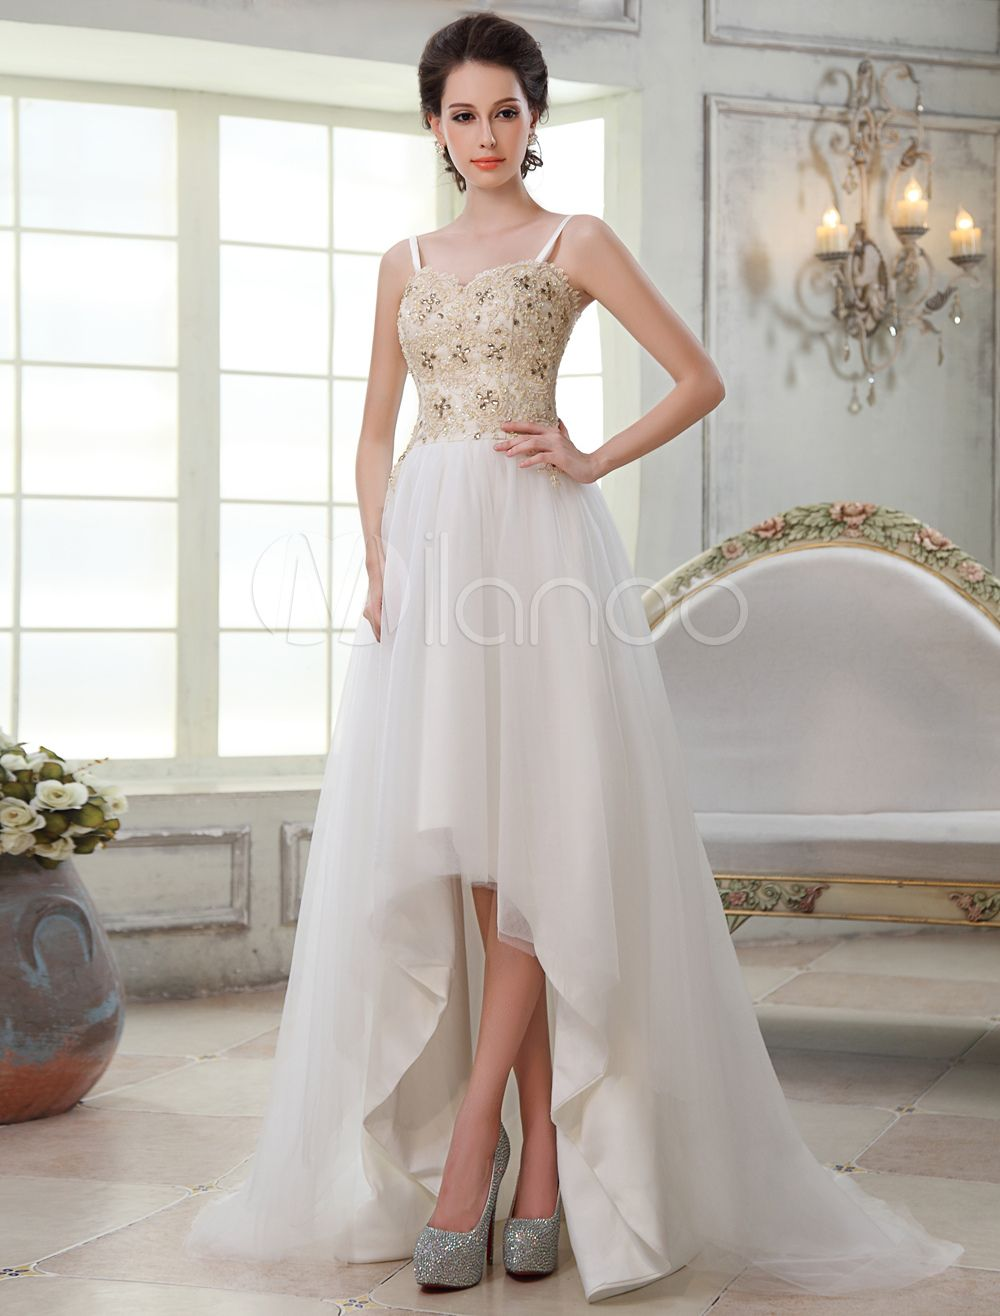 Lace spaghetti strap wedding dress  Aline Sweetheart Spaghetti Strap Asymmetrical Bridal Wedding Dress